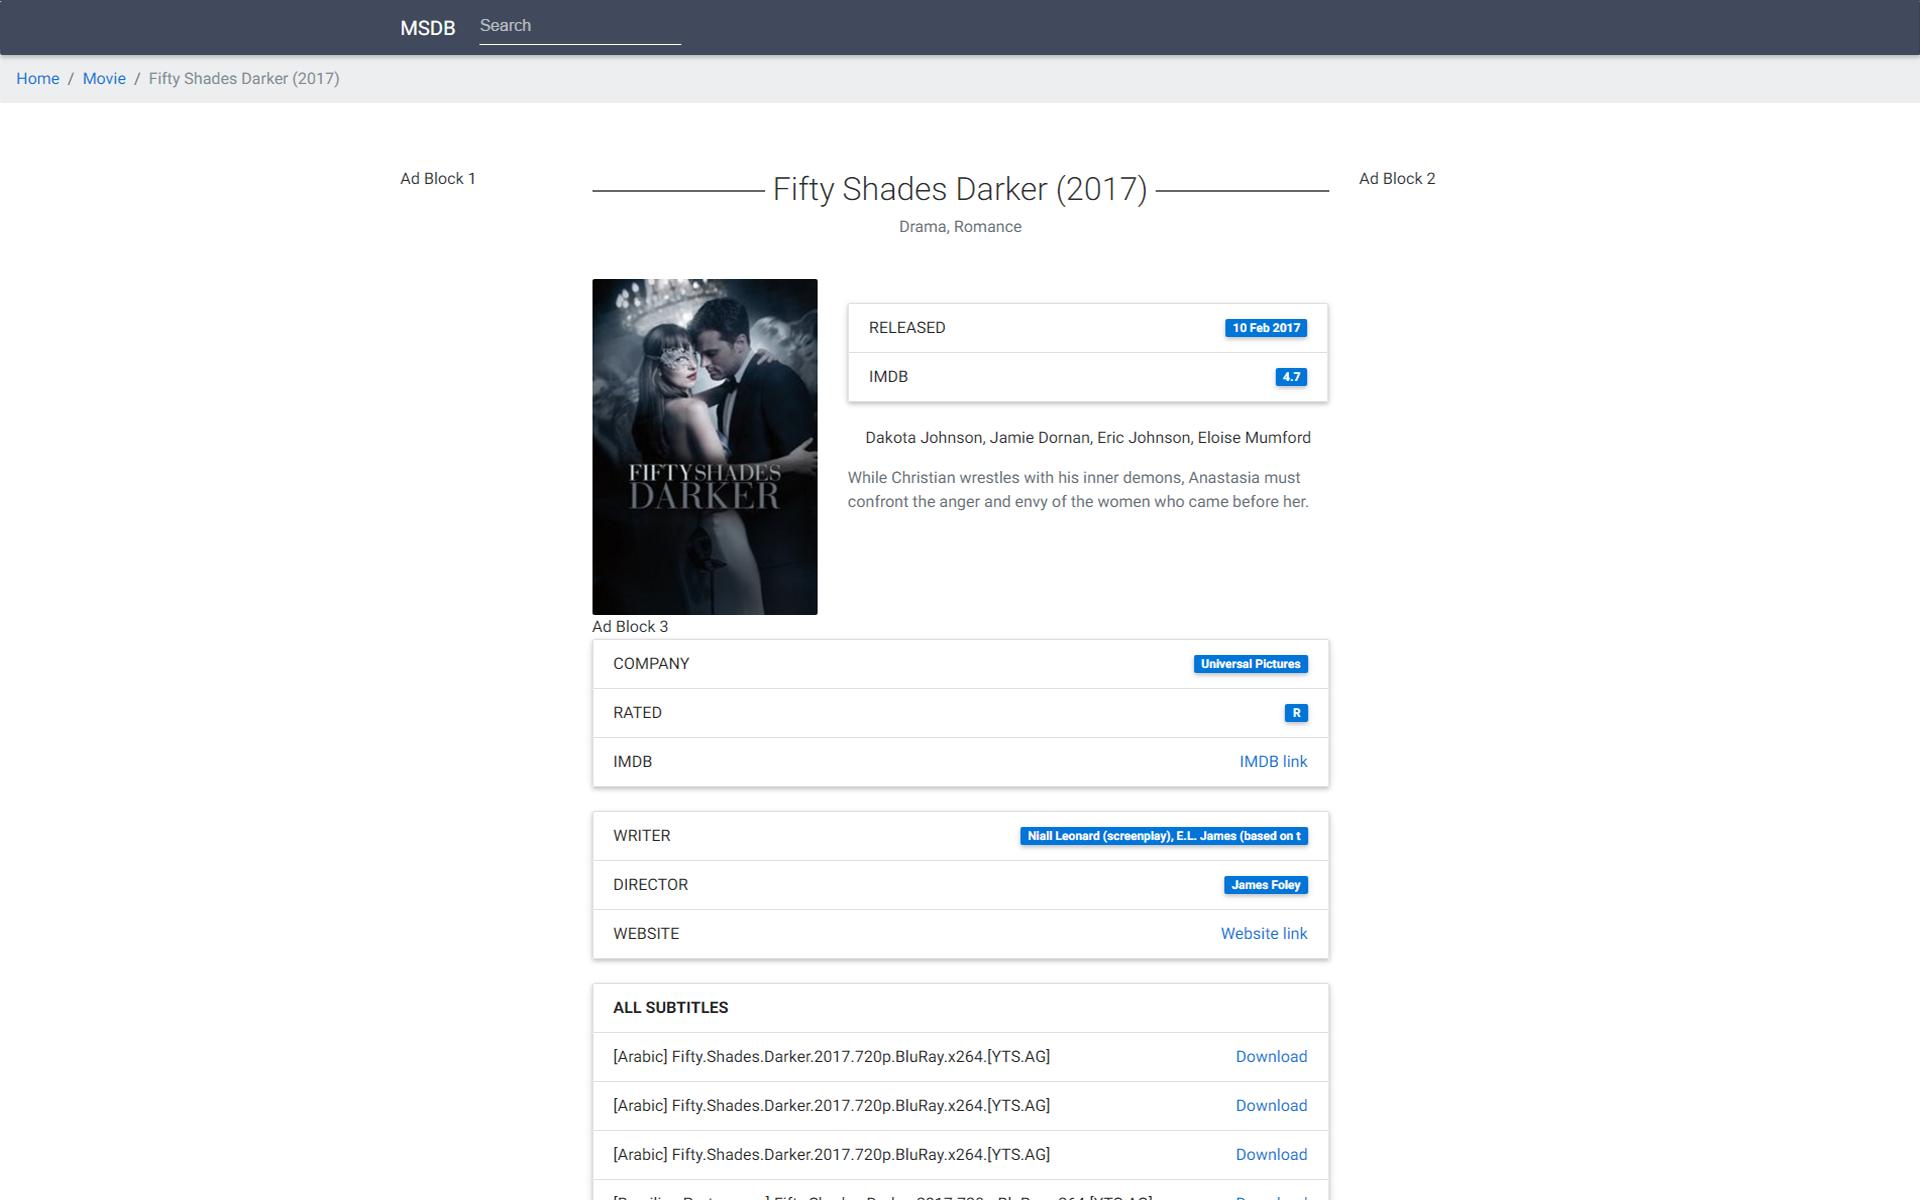 MSDB - Movie Subtitles Database